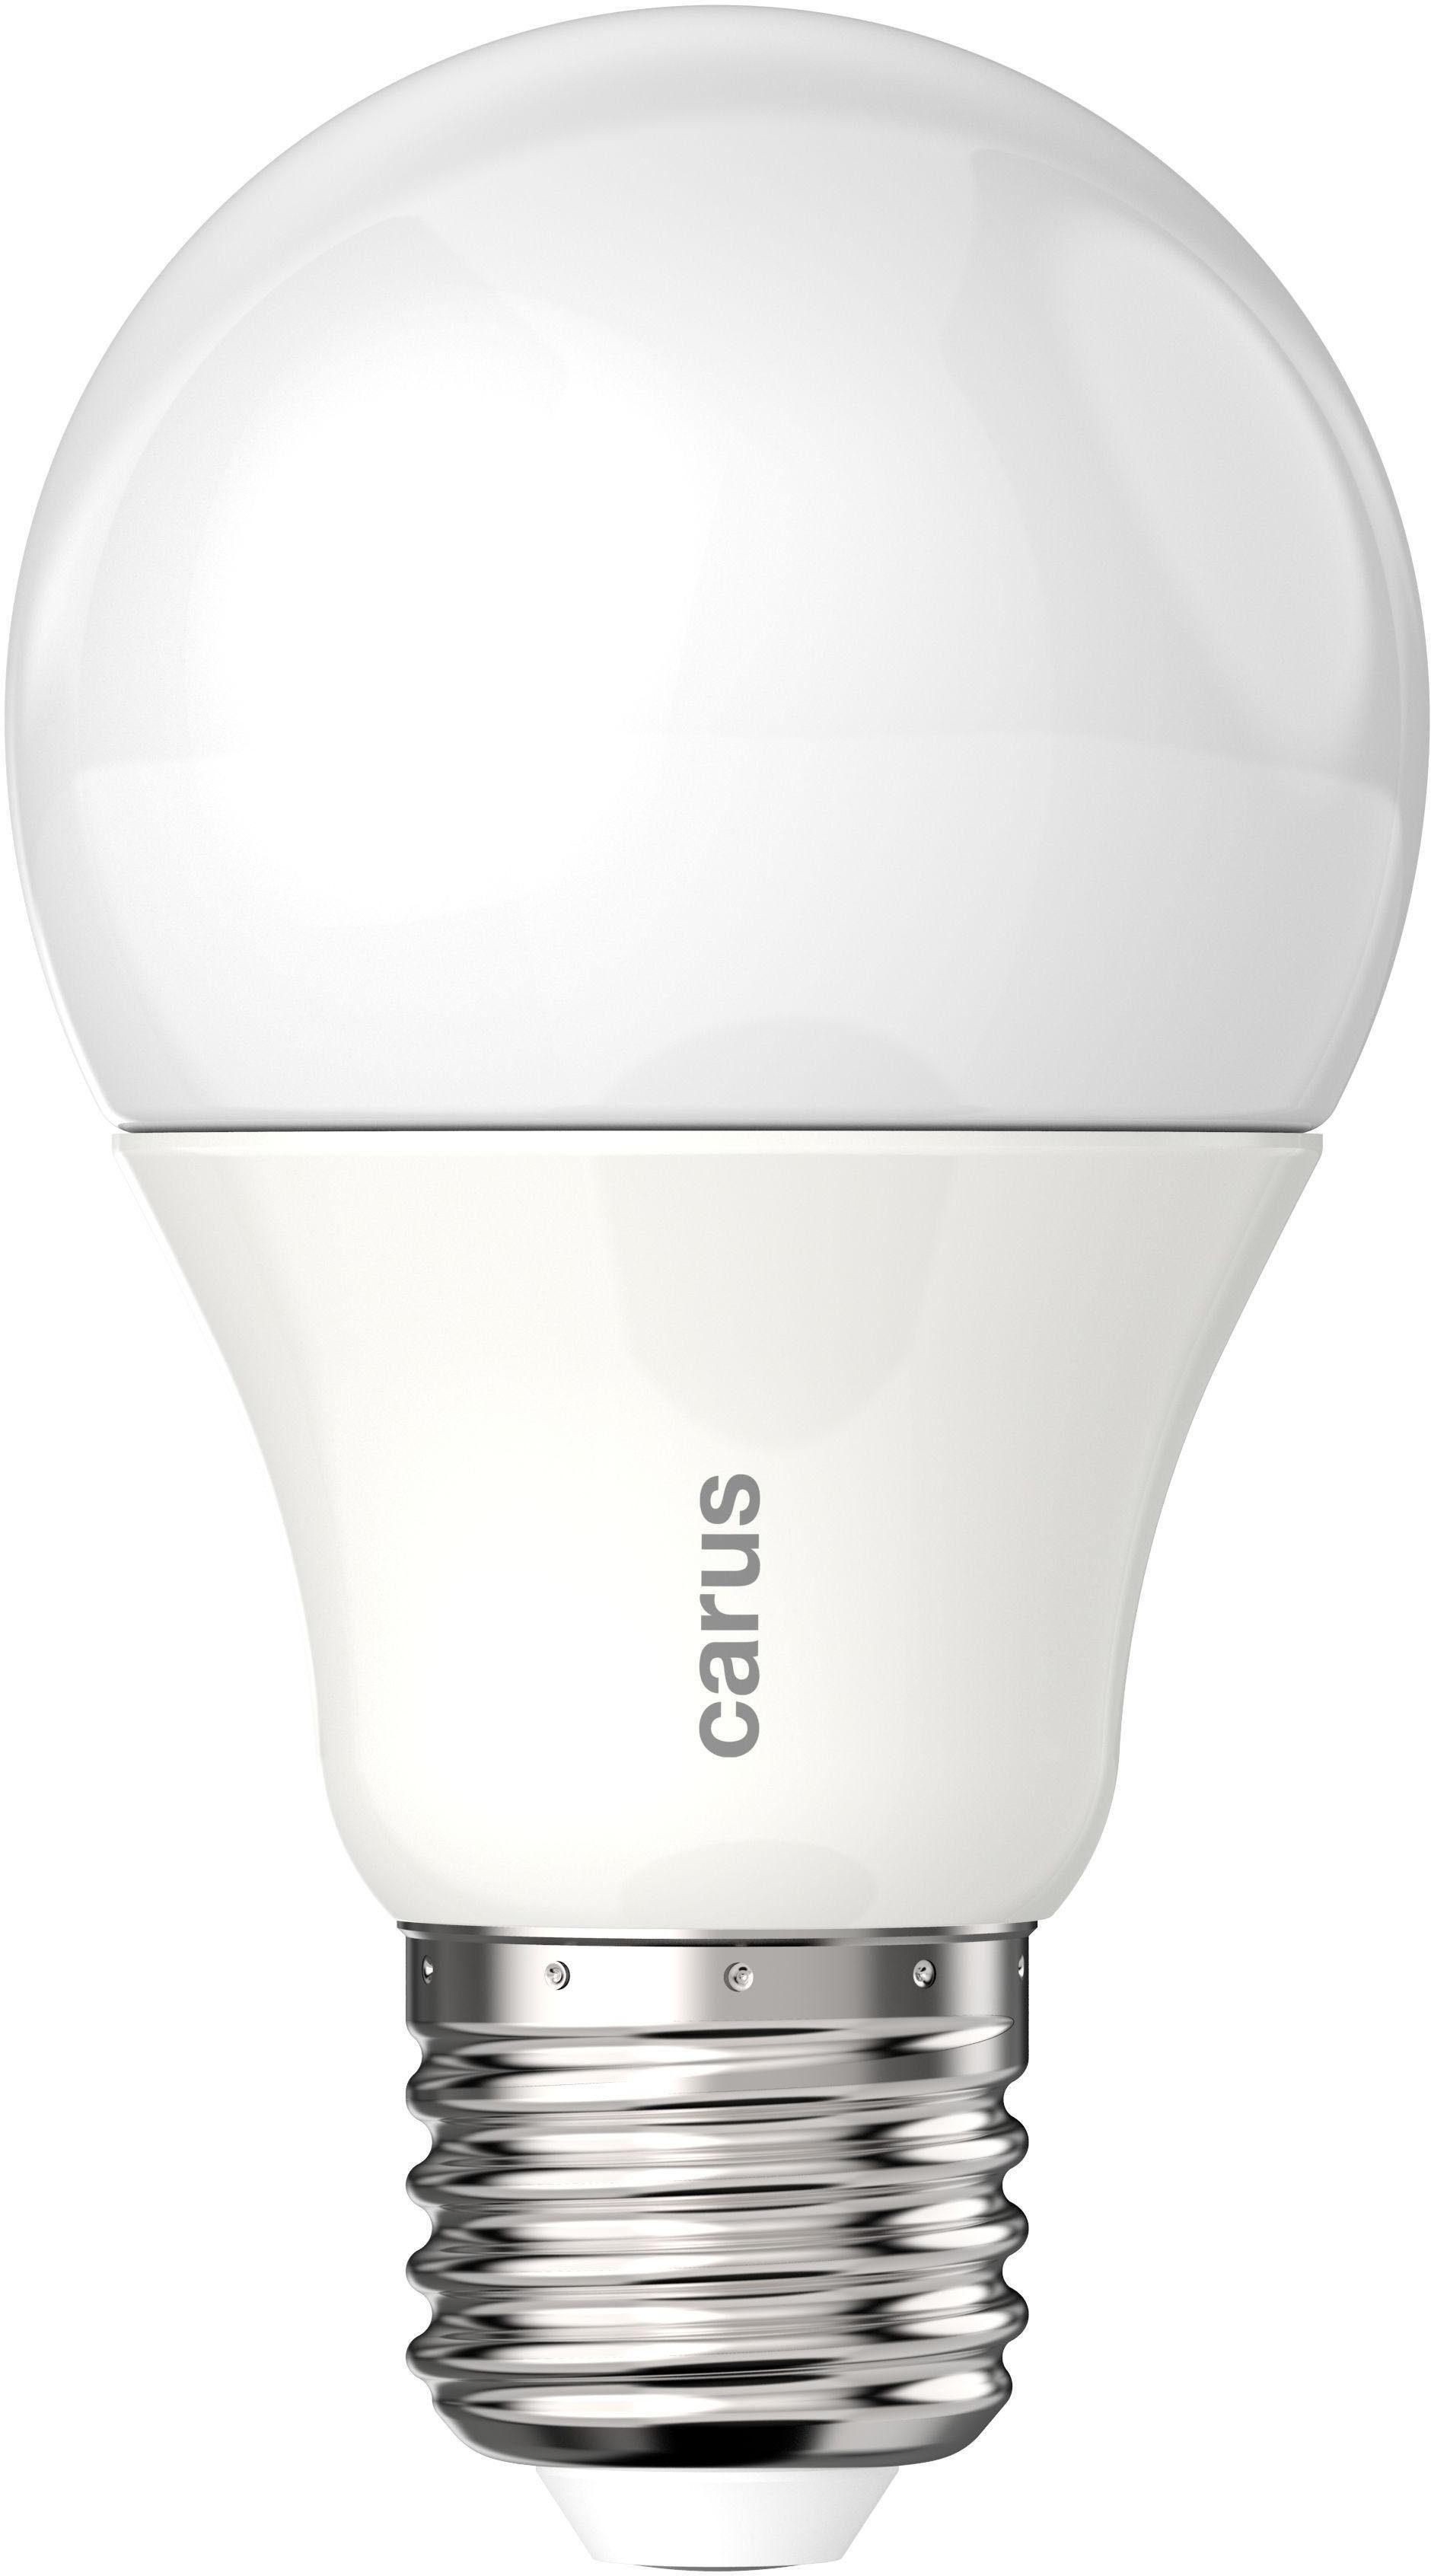 carus »Classic Dim 400« LED-Leuchtmittel, E27, 2 Stück, Warmweiß